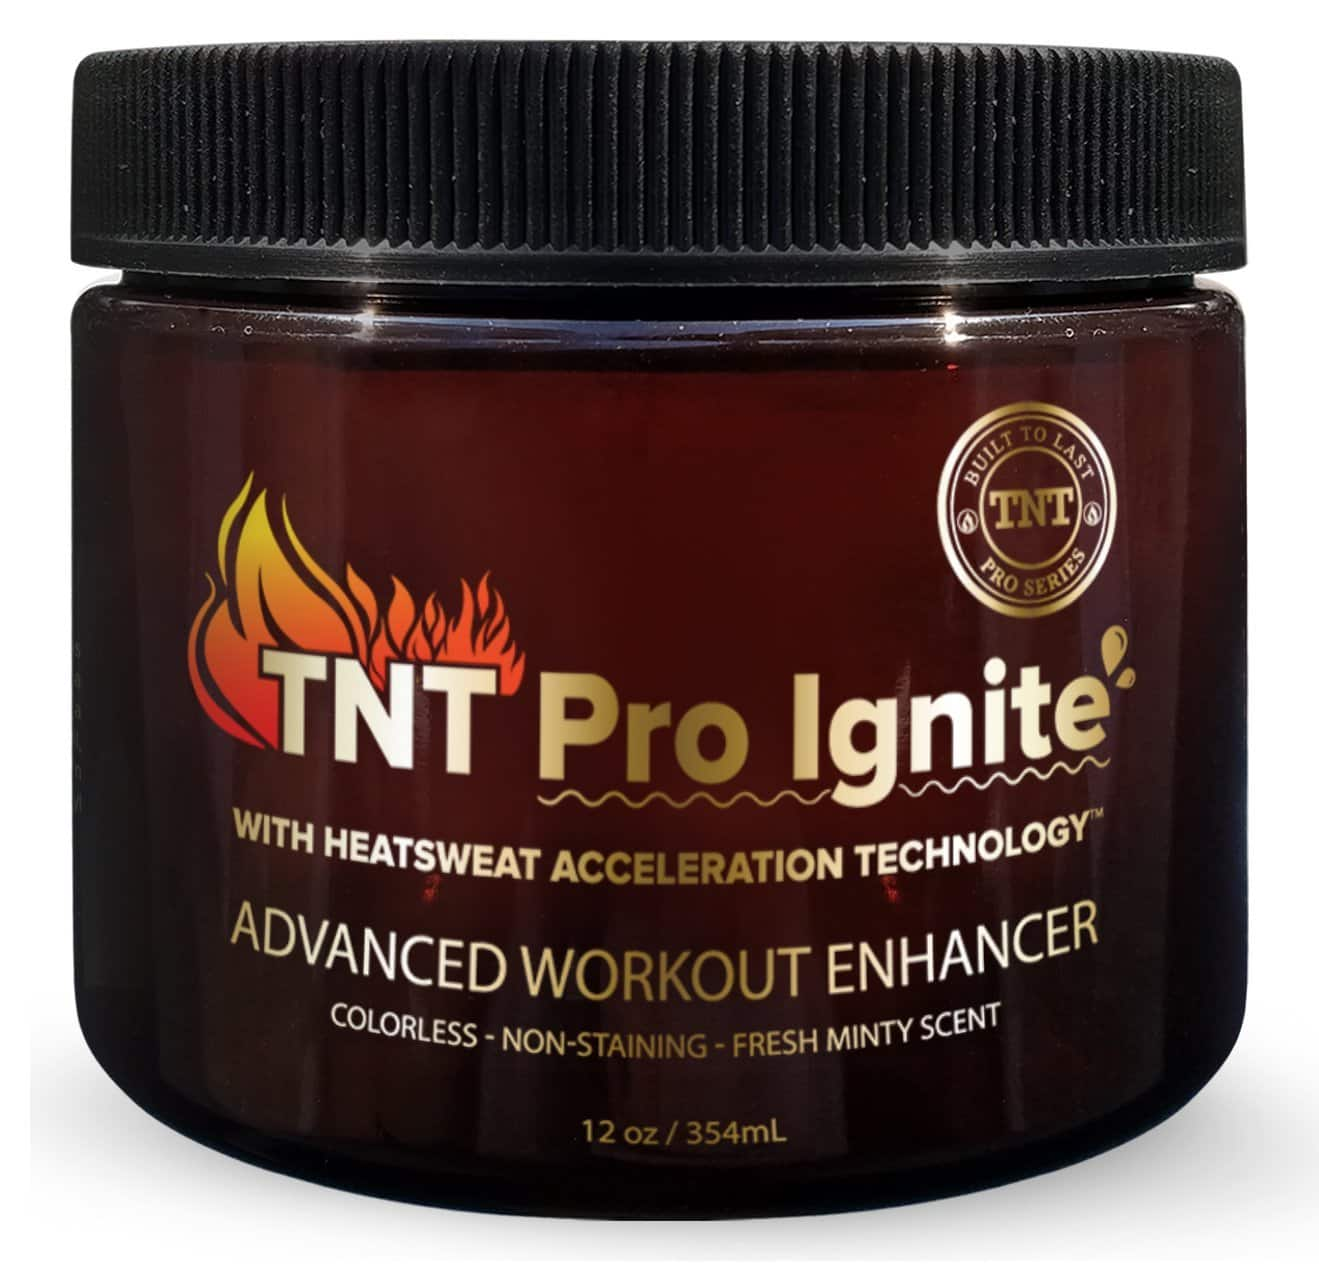 TNT Pro Series - Ignite Stomach Fat Burner Slimming Cream $11.99